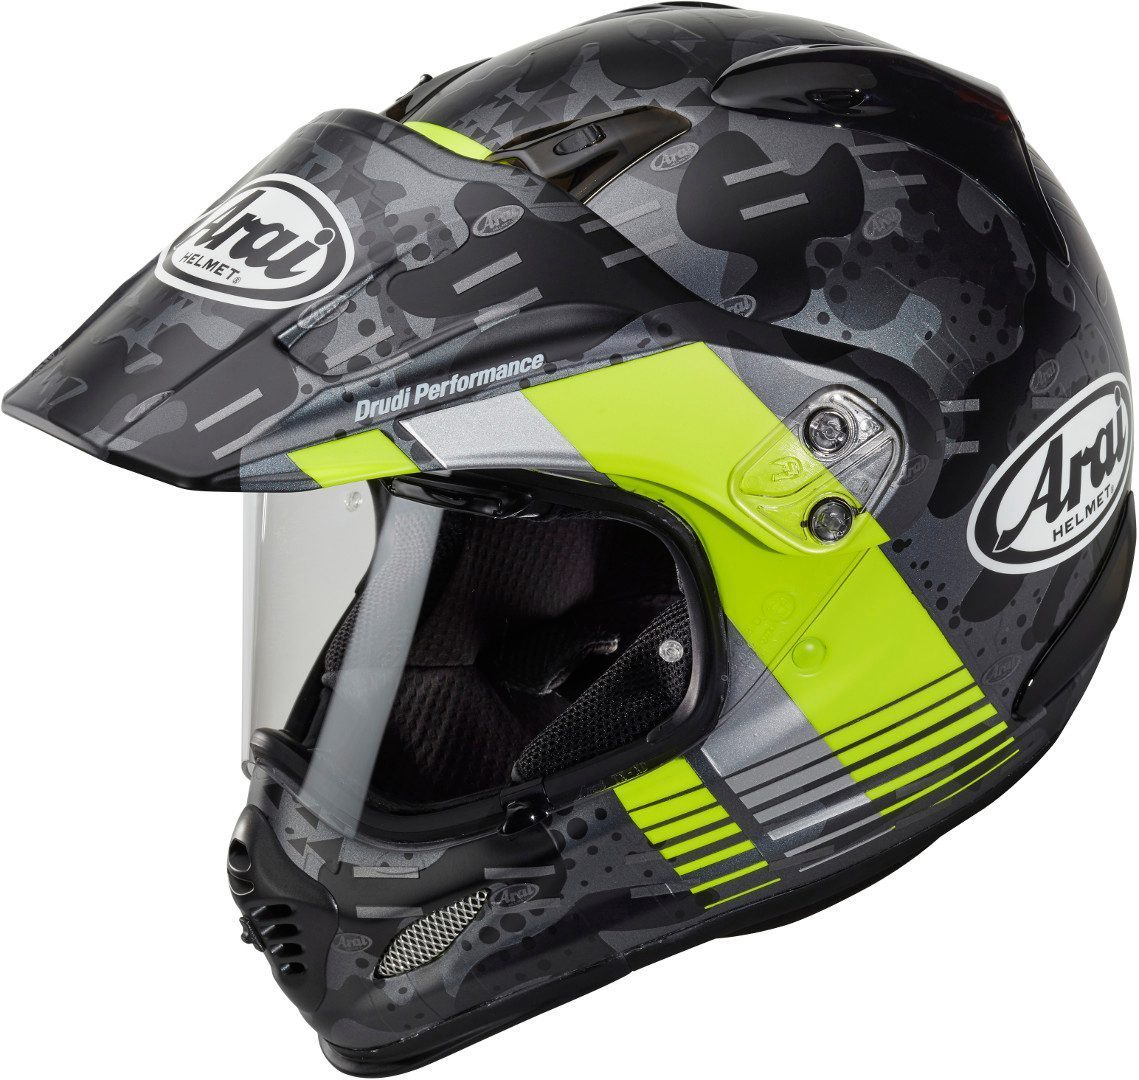 Arai Tour-X4 Cover Motocross Helm, grau-gelb, Größe S, grau-gelb, Größe S